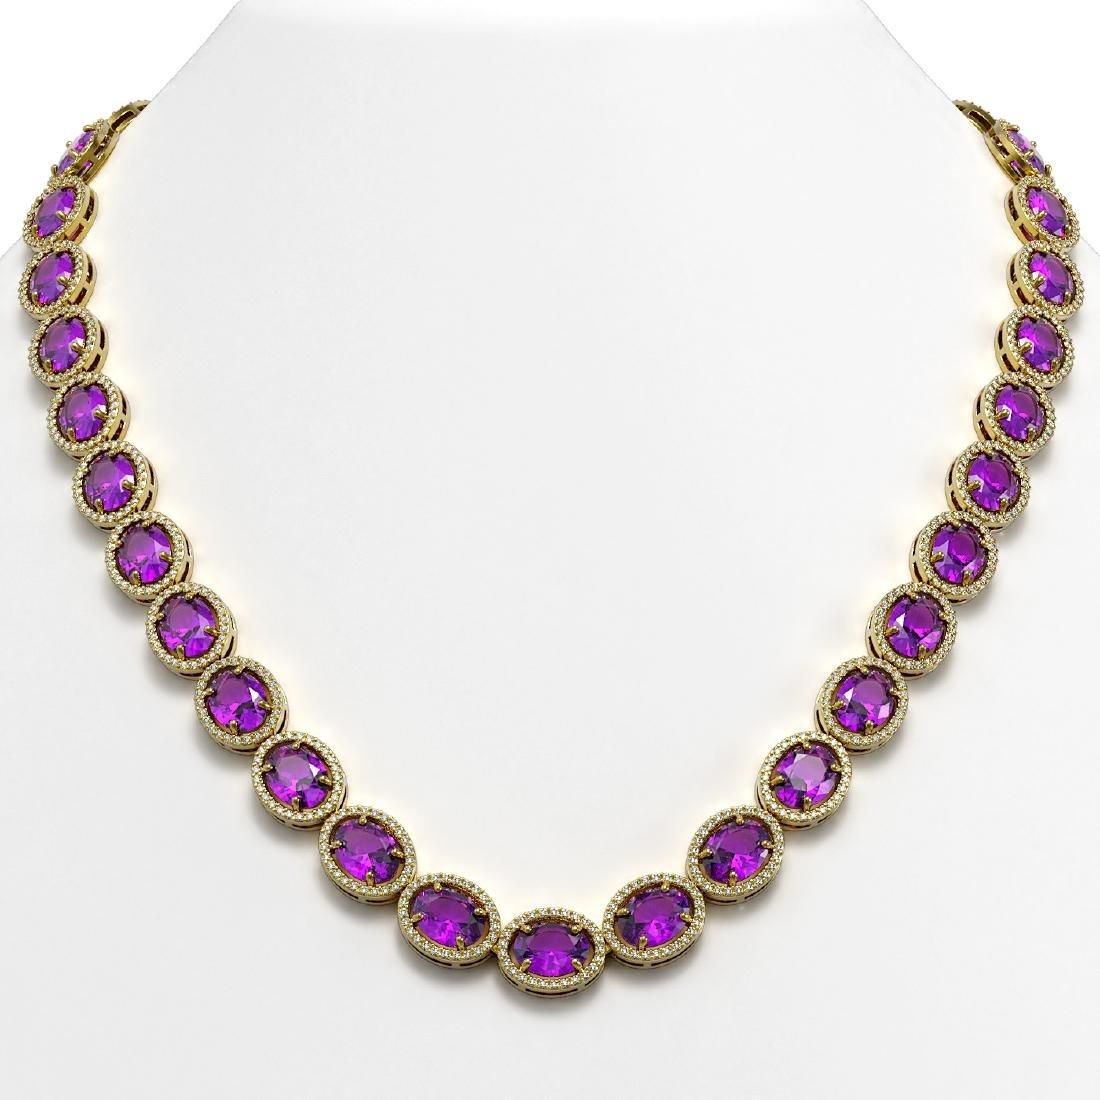 57.07 CTW Amethyst & Diamond Halo Necklace 10K Yellow